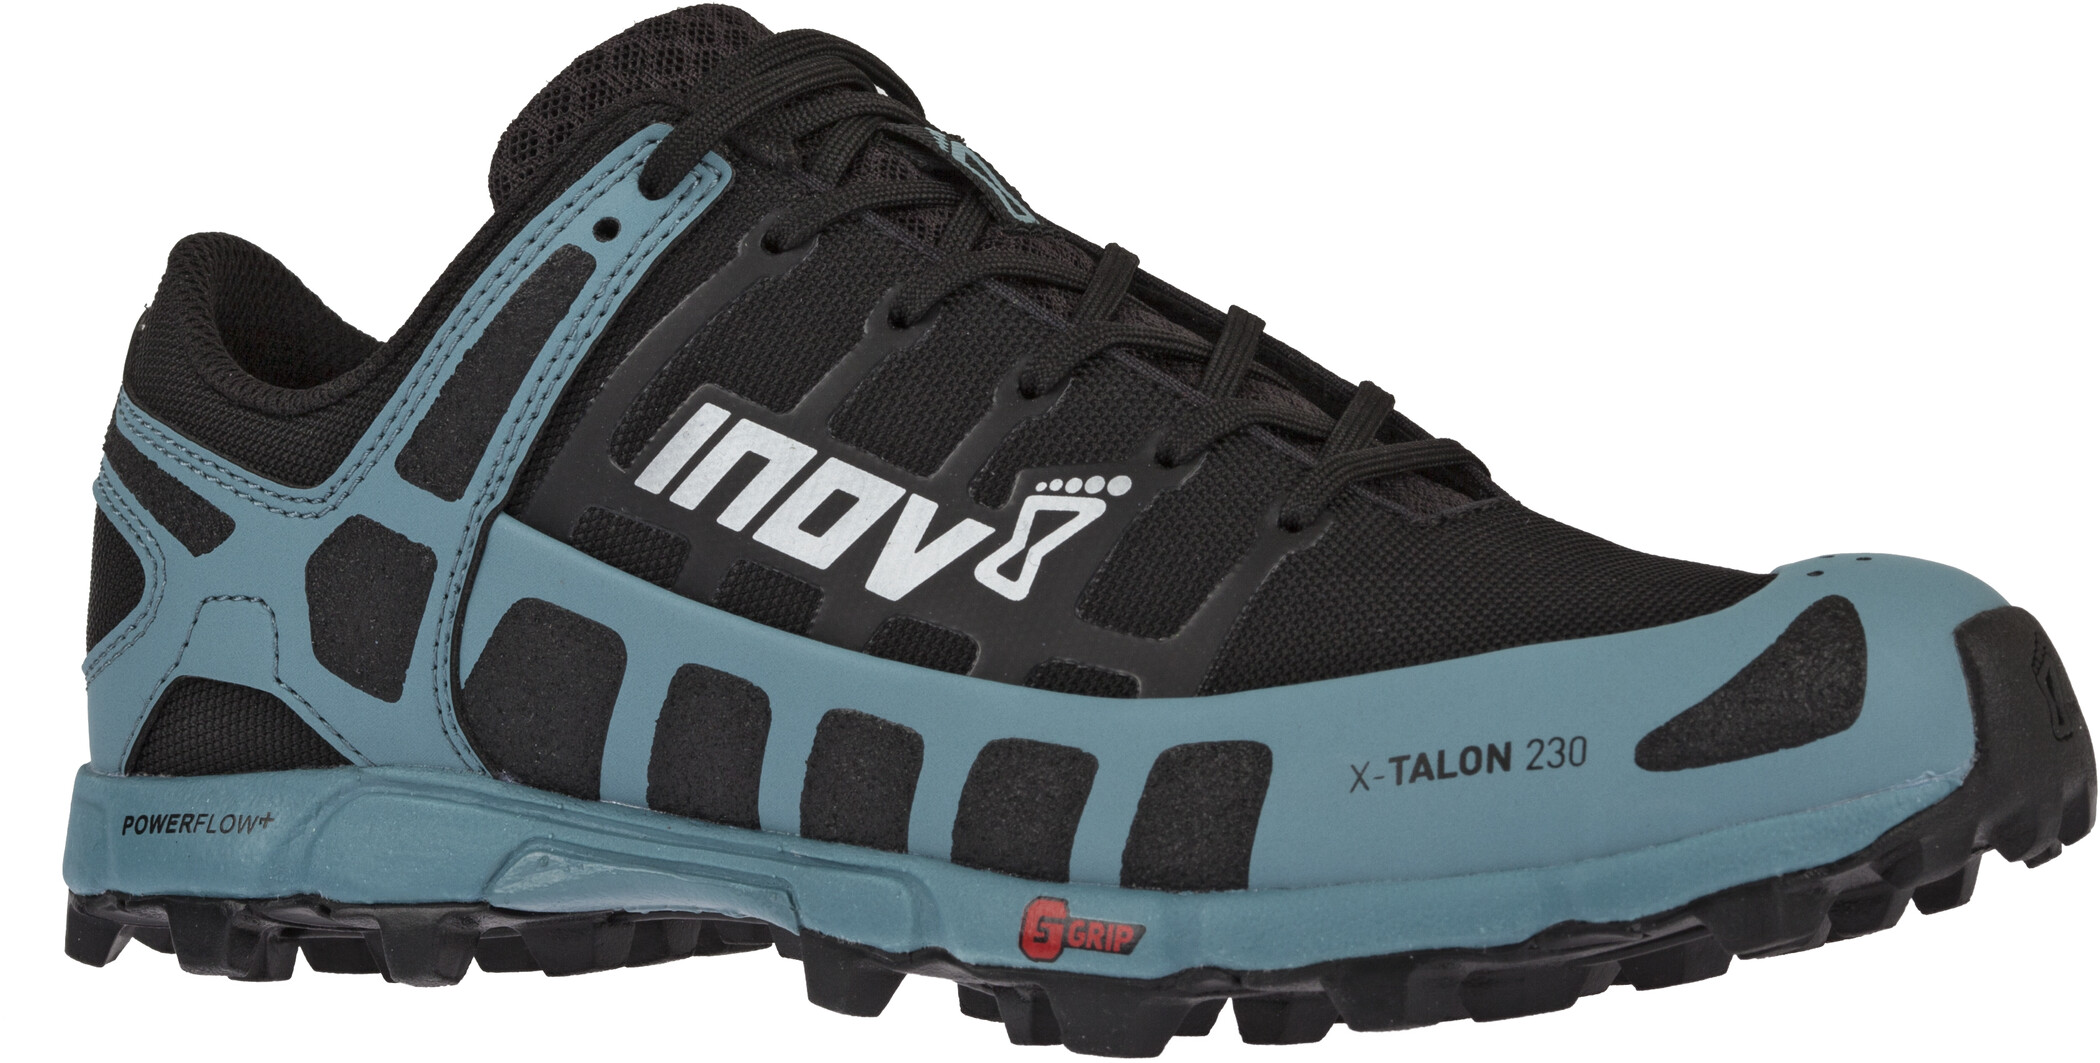 inov-8 X-Talon 230 Løbesko Damer, black/ blue grey (2019)   Running shoes